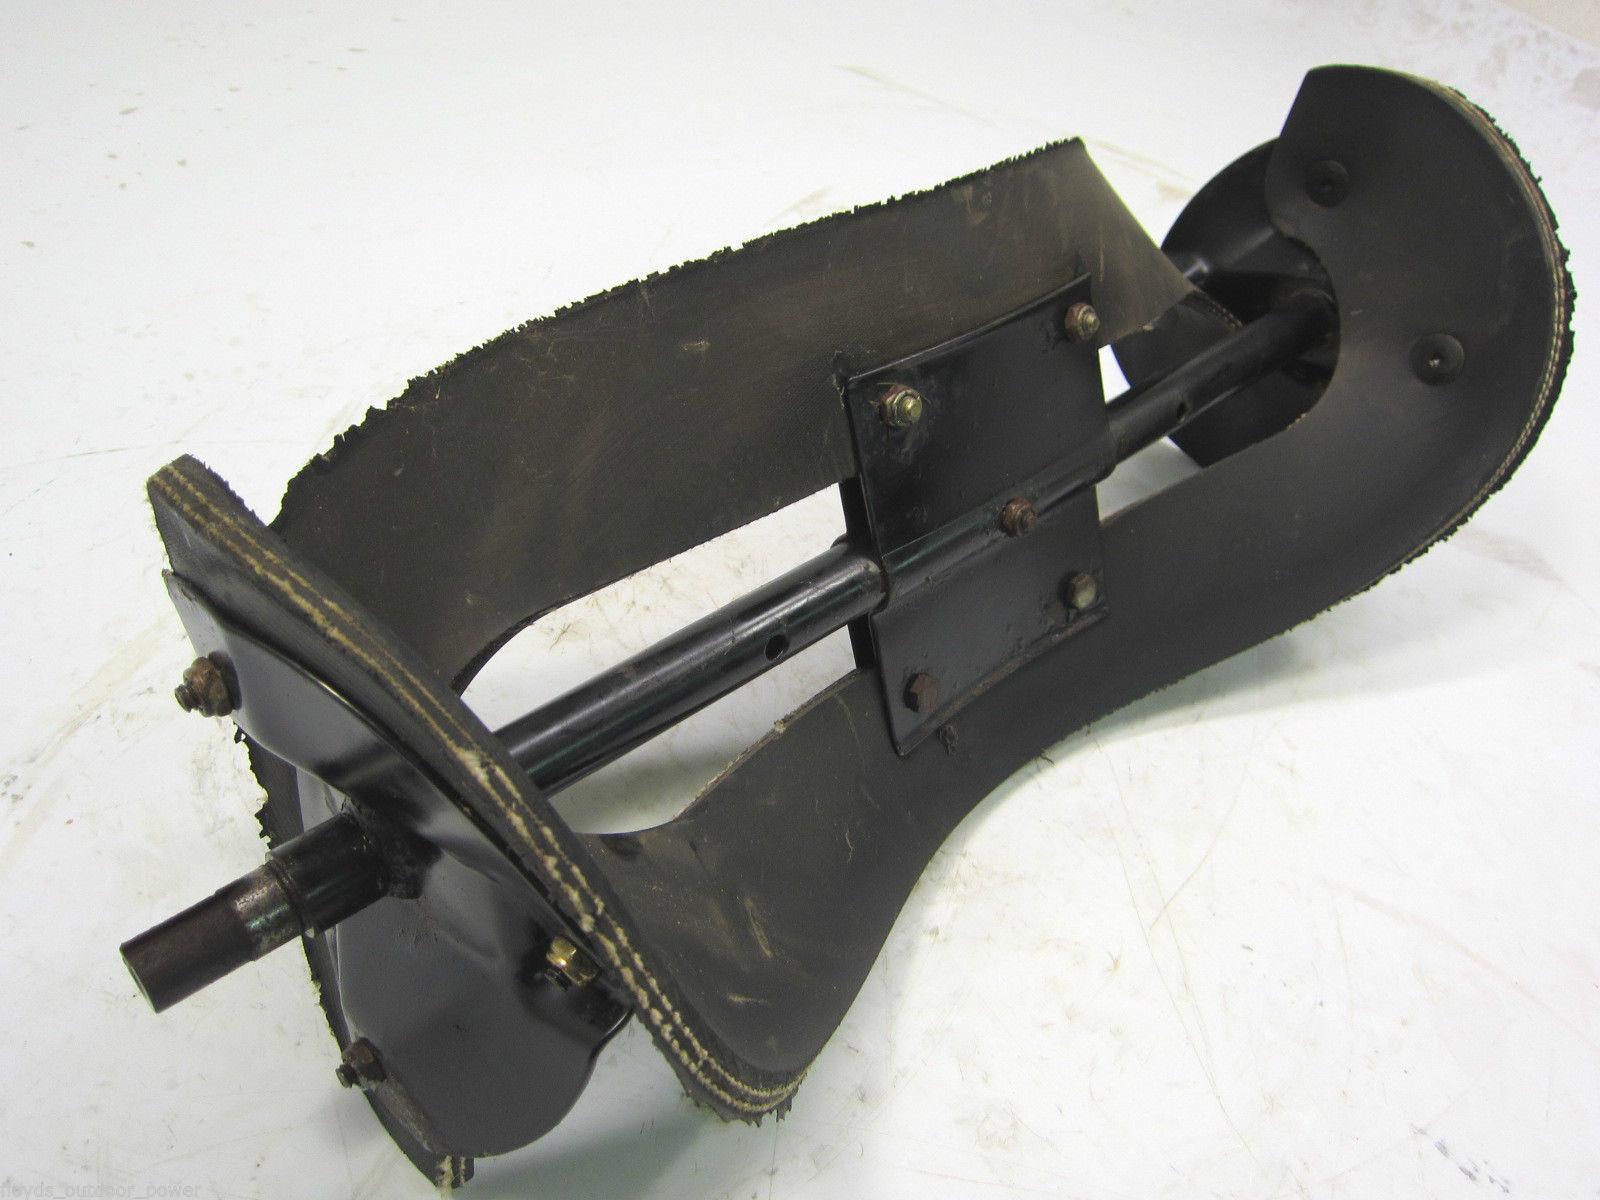 Ebay Private Listing >> Toro 5HP Rtek CCR2450 Snow thrower blower 38419 Auger rotor blade structure NICE | eBay